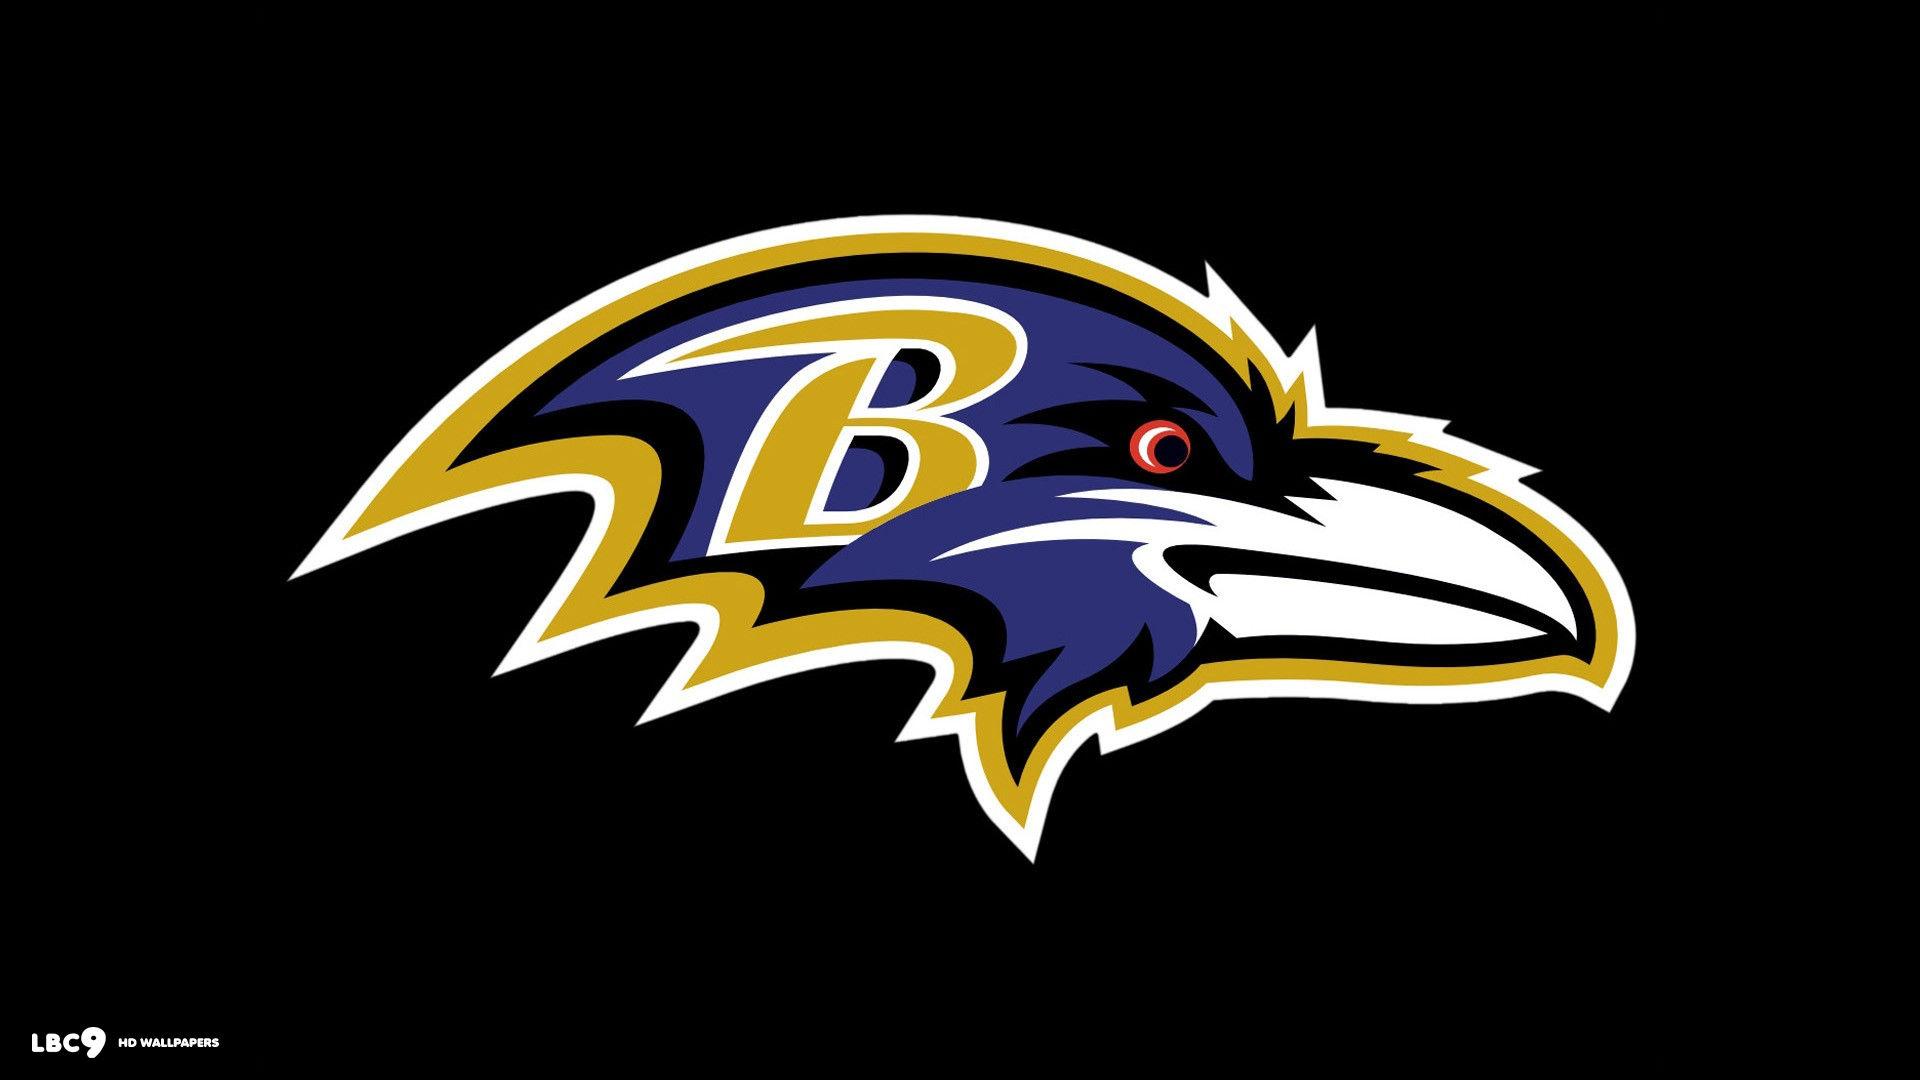 [NFL] Preview 2015: Baltimore Ravens